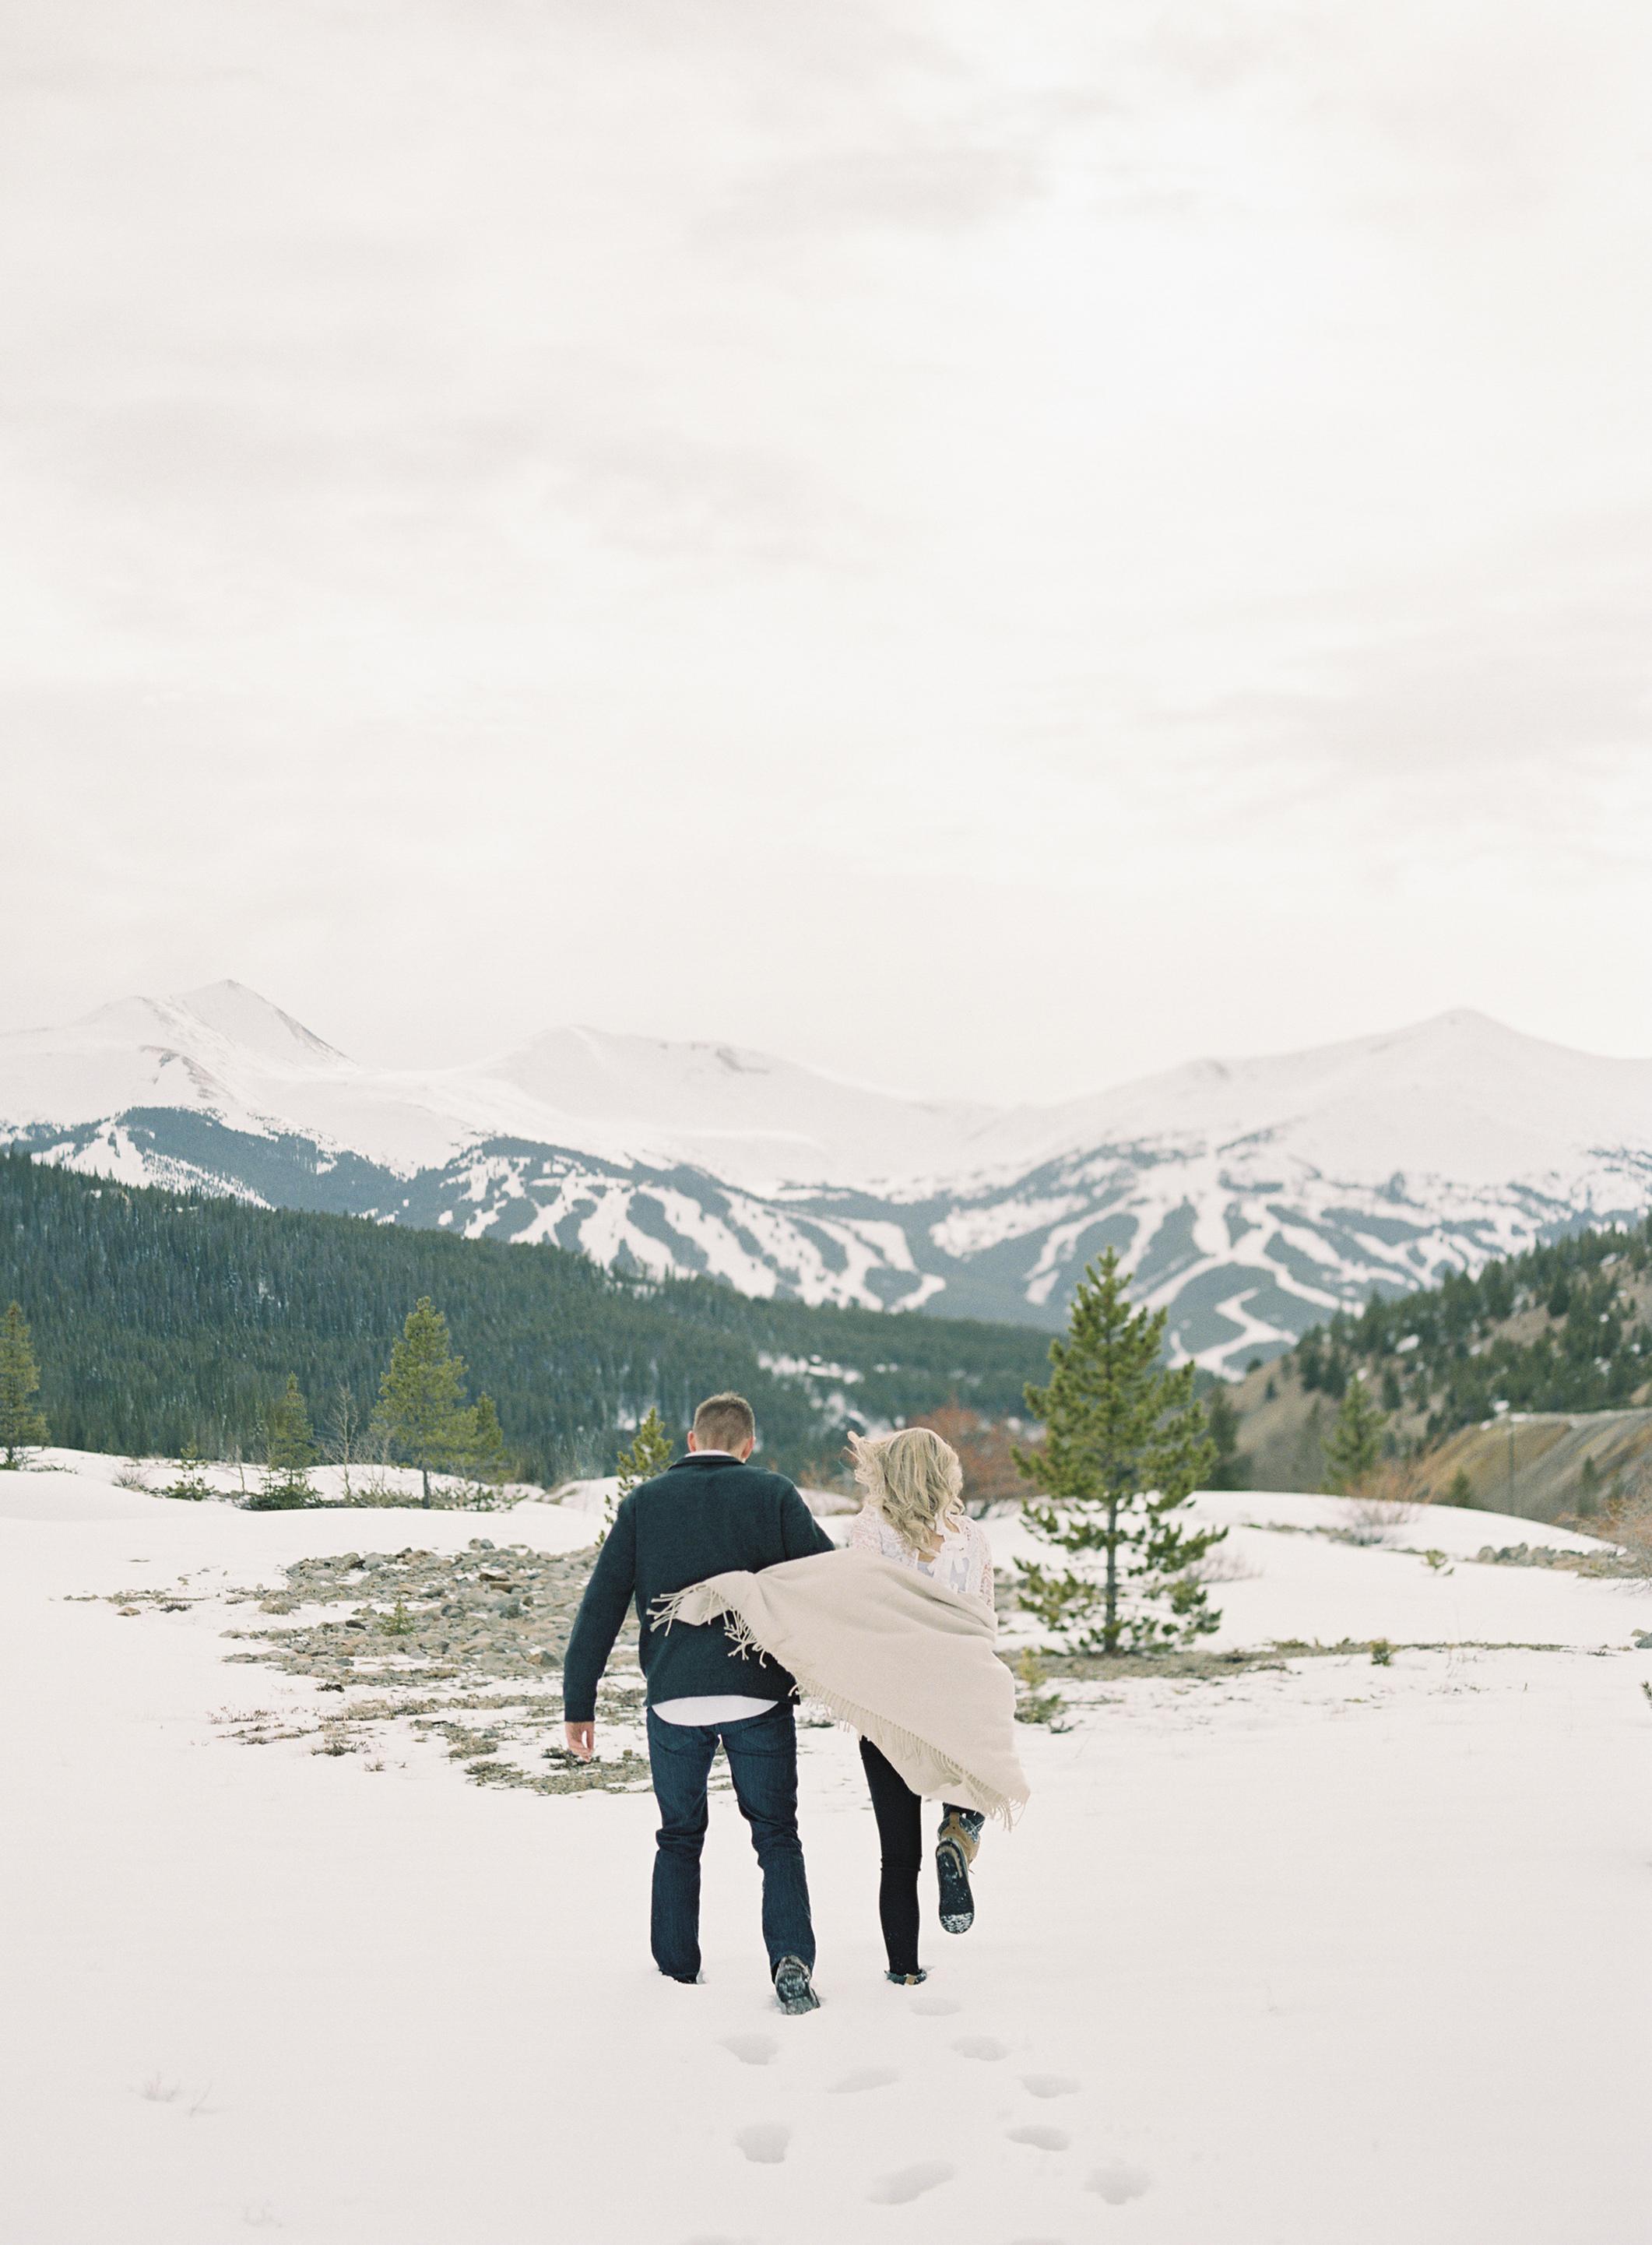 Sarah and John Engaged-Carrie King Photographer95.jpg